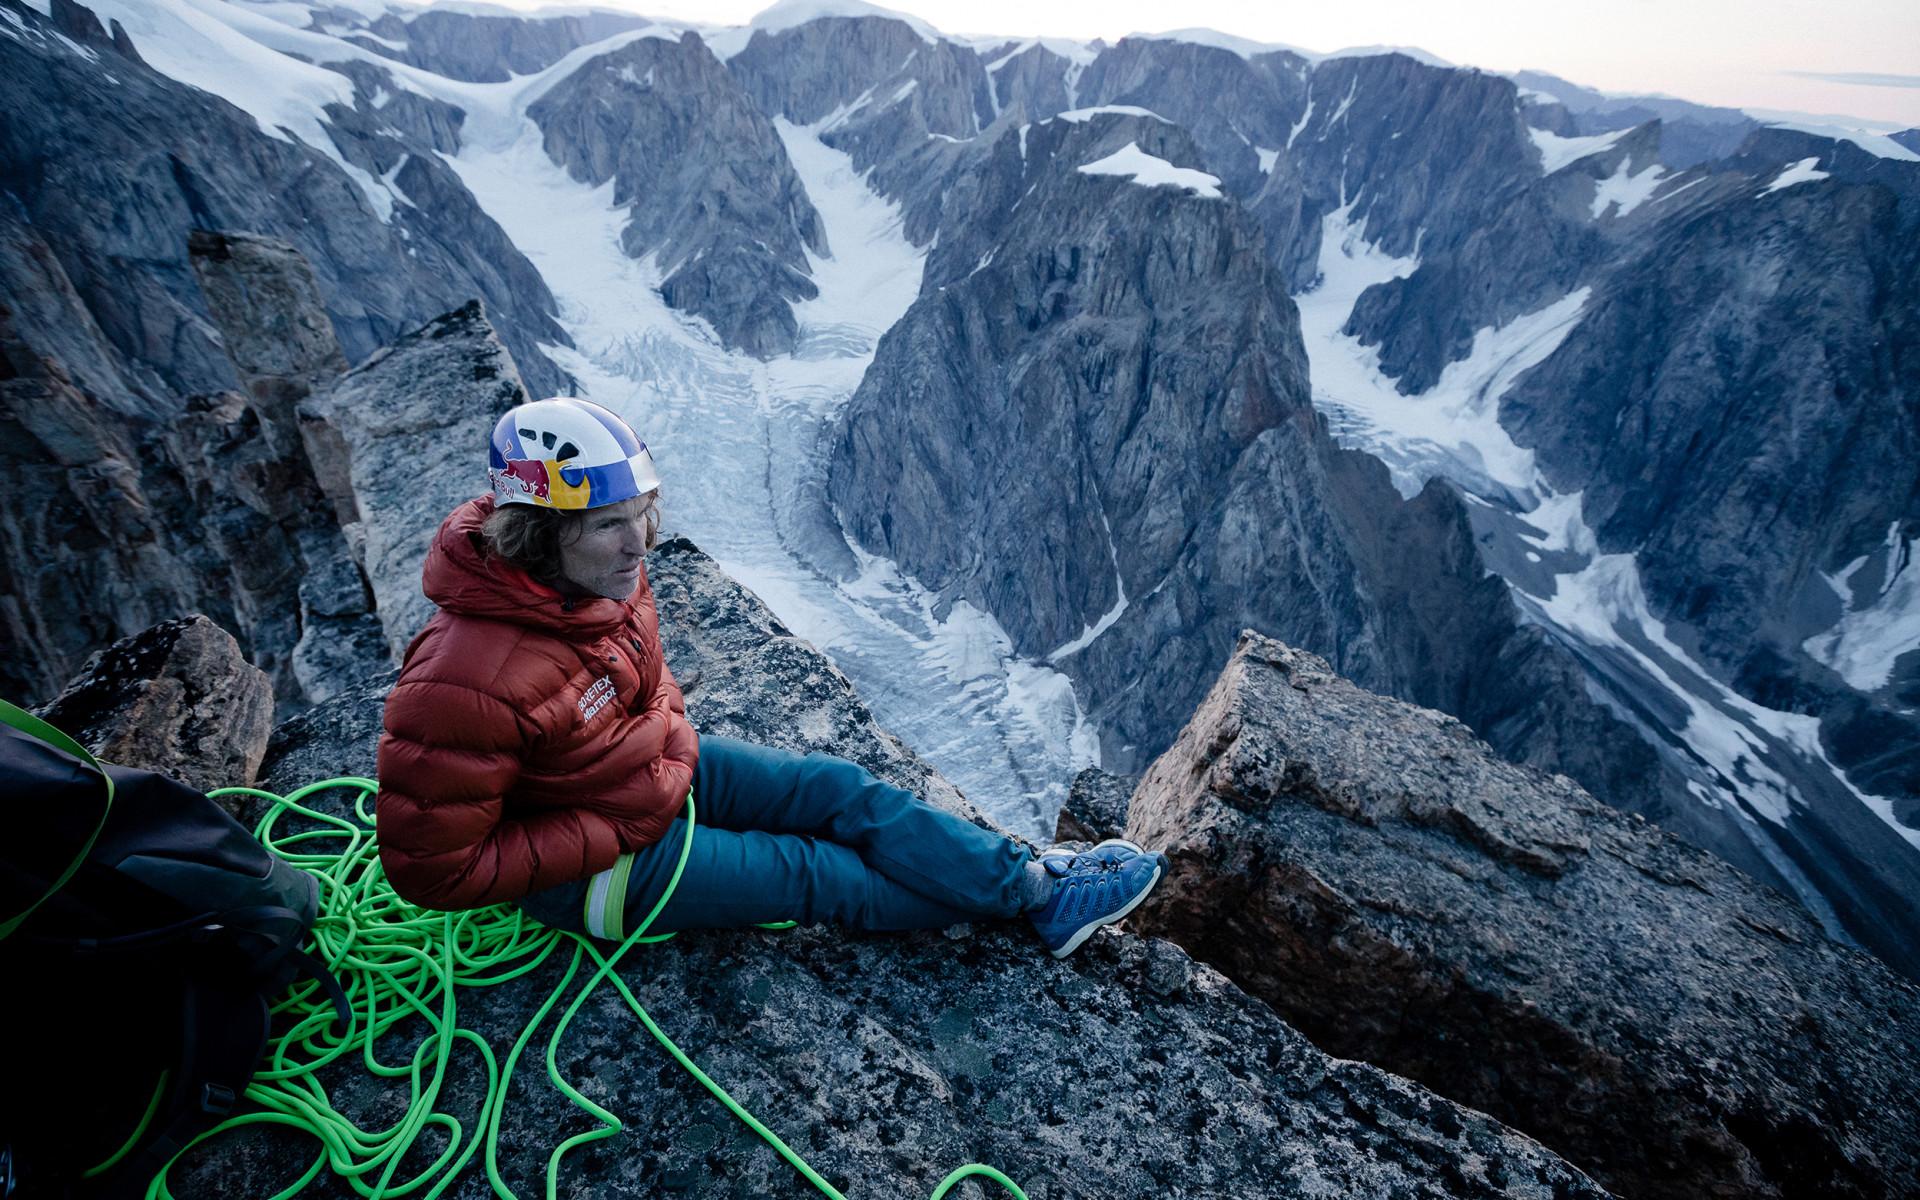 Nouvel objectif : l'ascension d'un « Big Wall » au Groenland